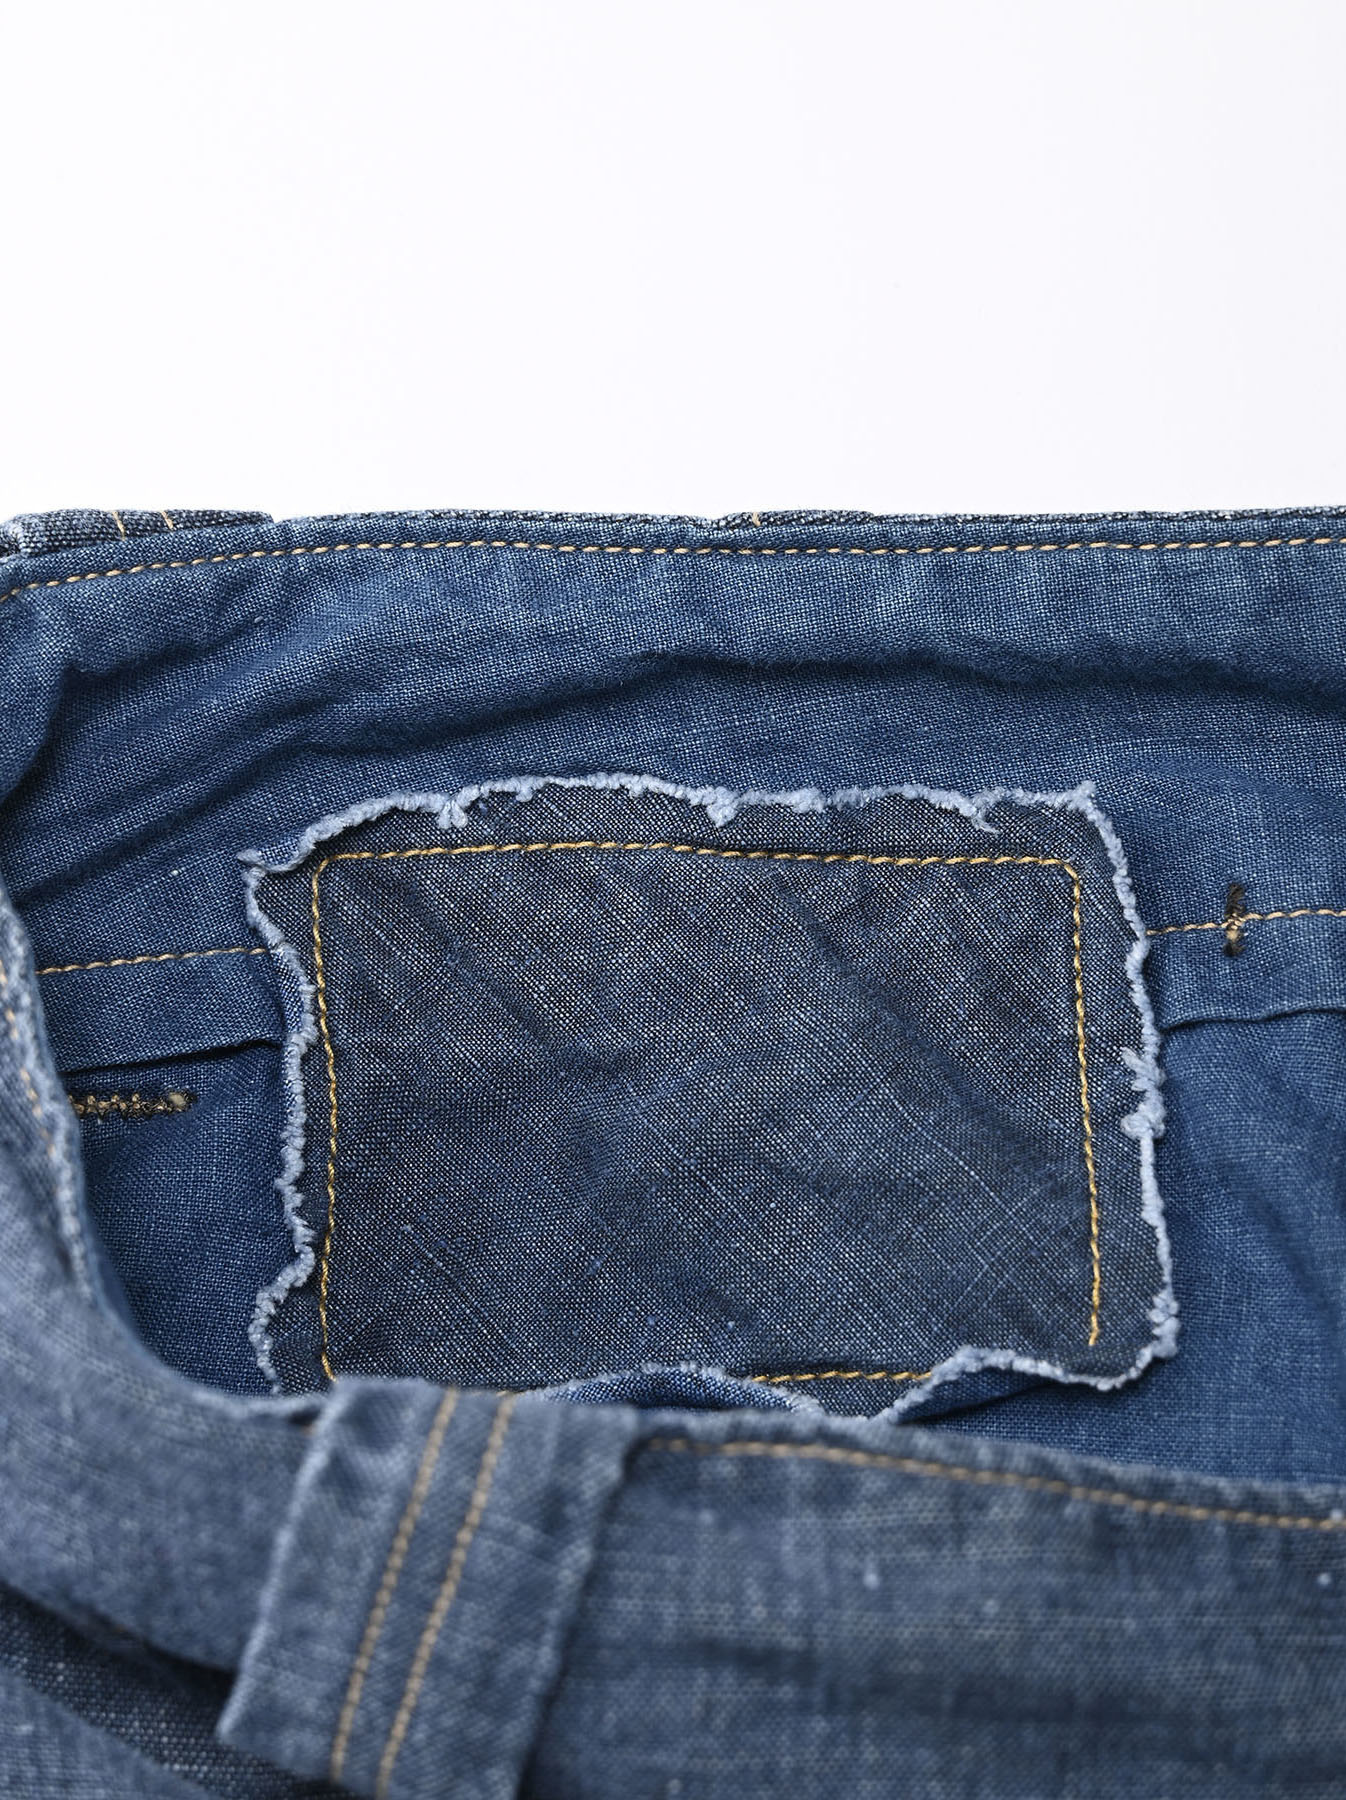 Indigo Linen 908 Easy Sail Pants Distressed (0721)-12